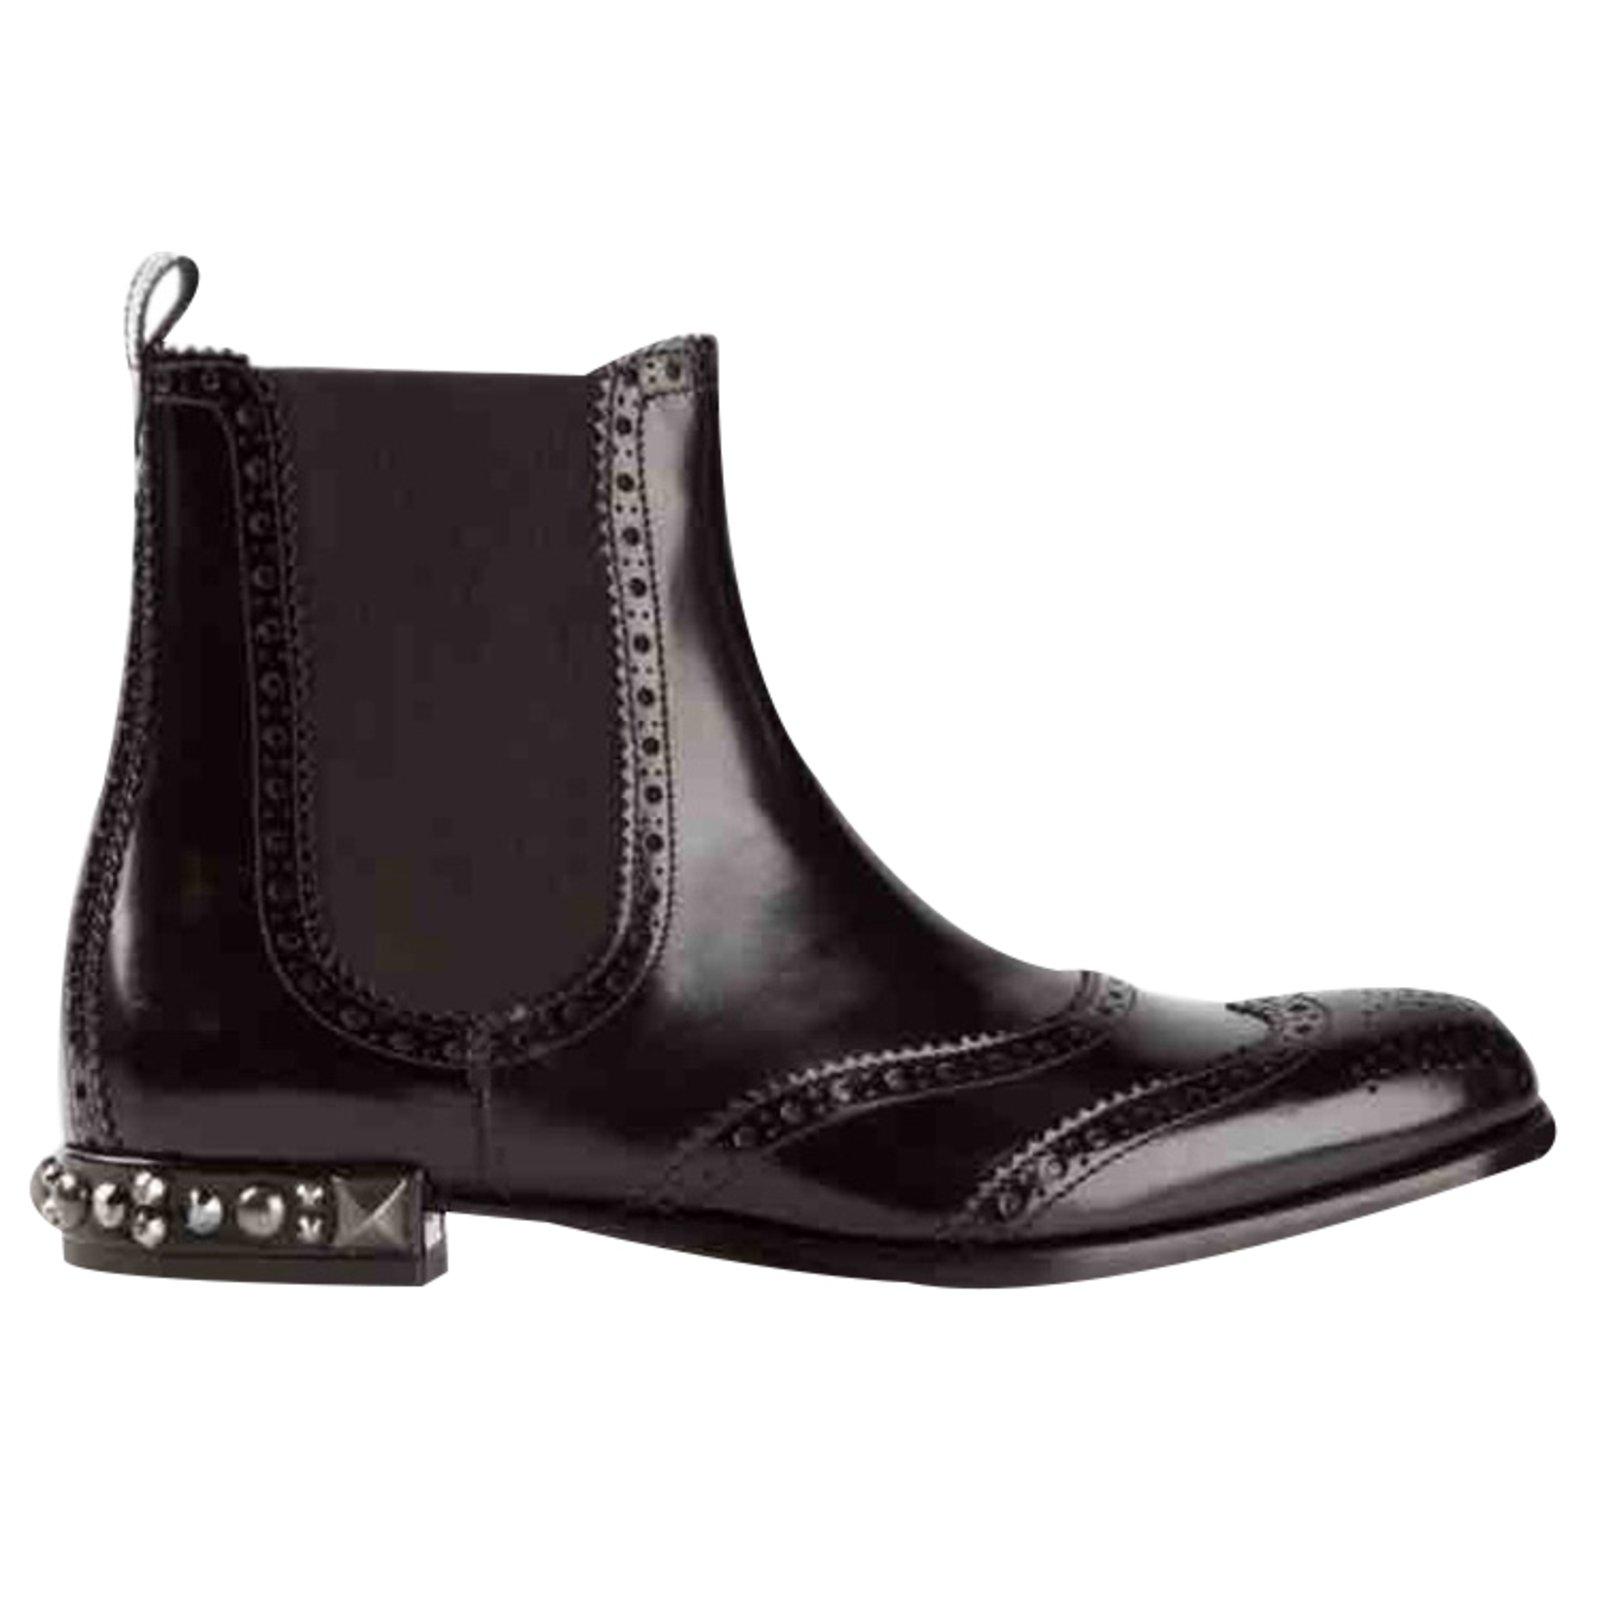 Occasion - BootsDolce & Gabbana dXlMheNV